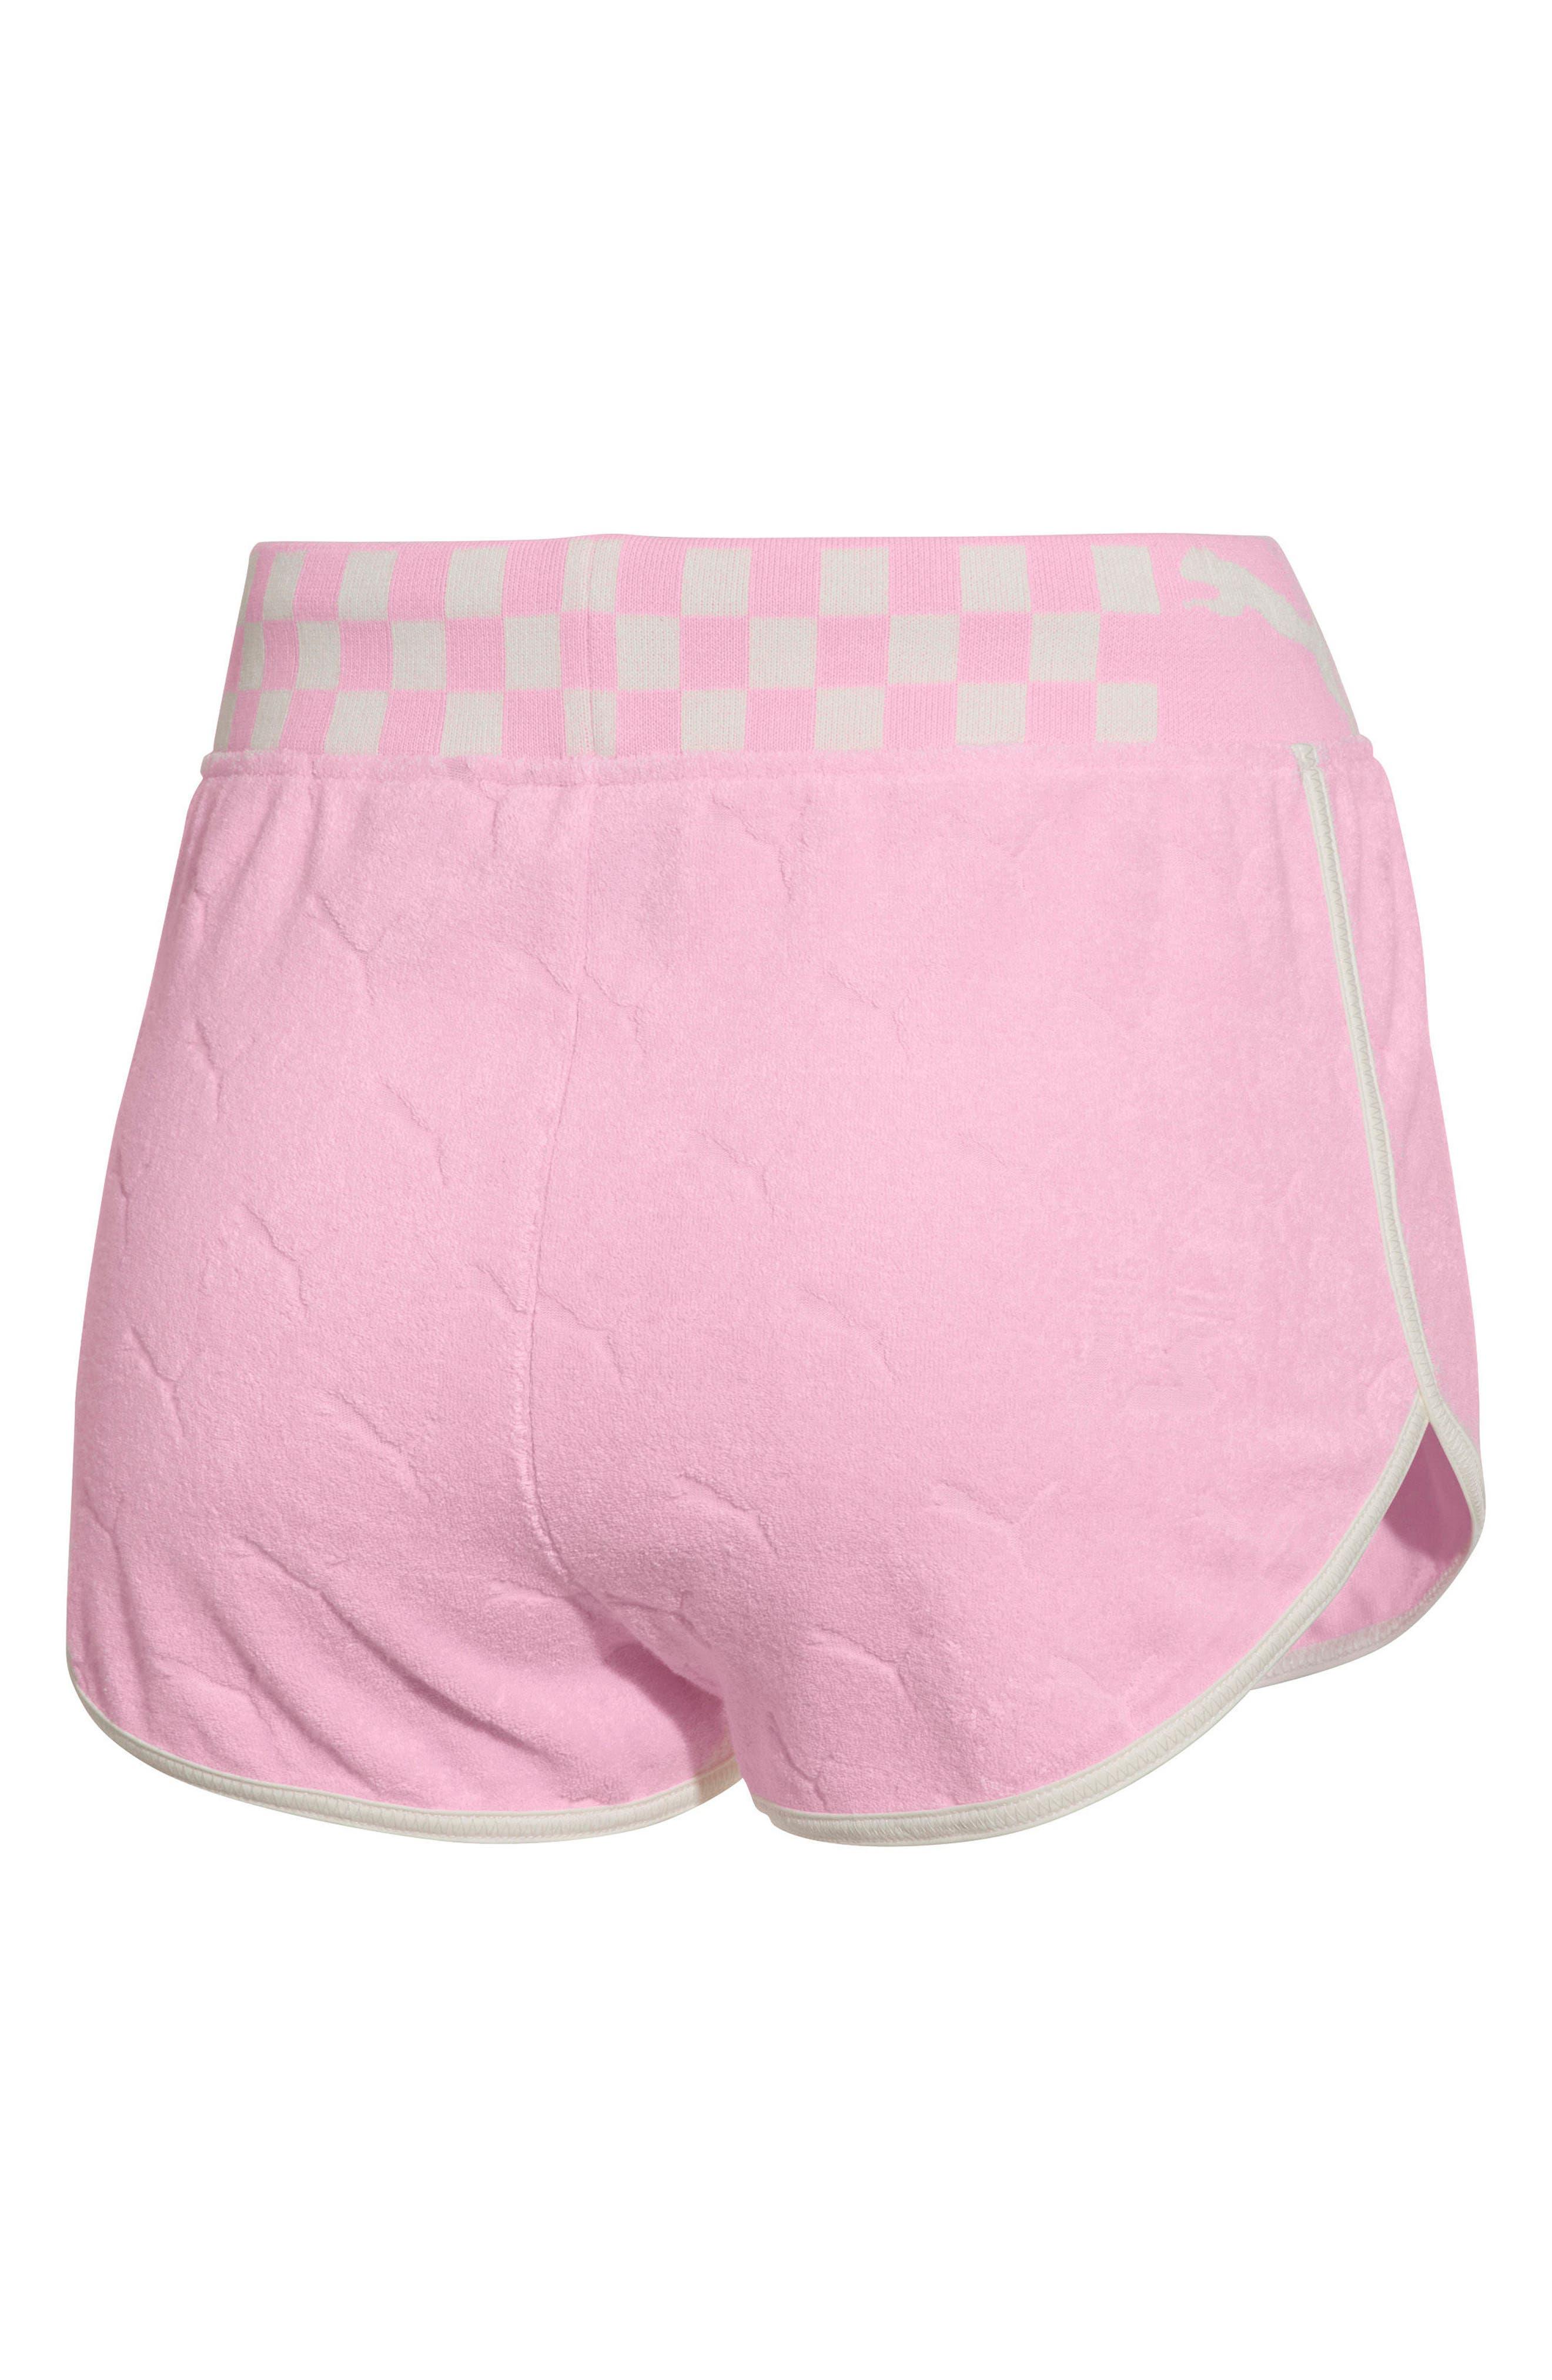 PUMA by Rihanna Terry Cloth Dolphin Shorts,                             Alternate thumbnail 2, color,